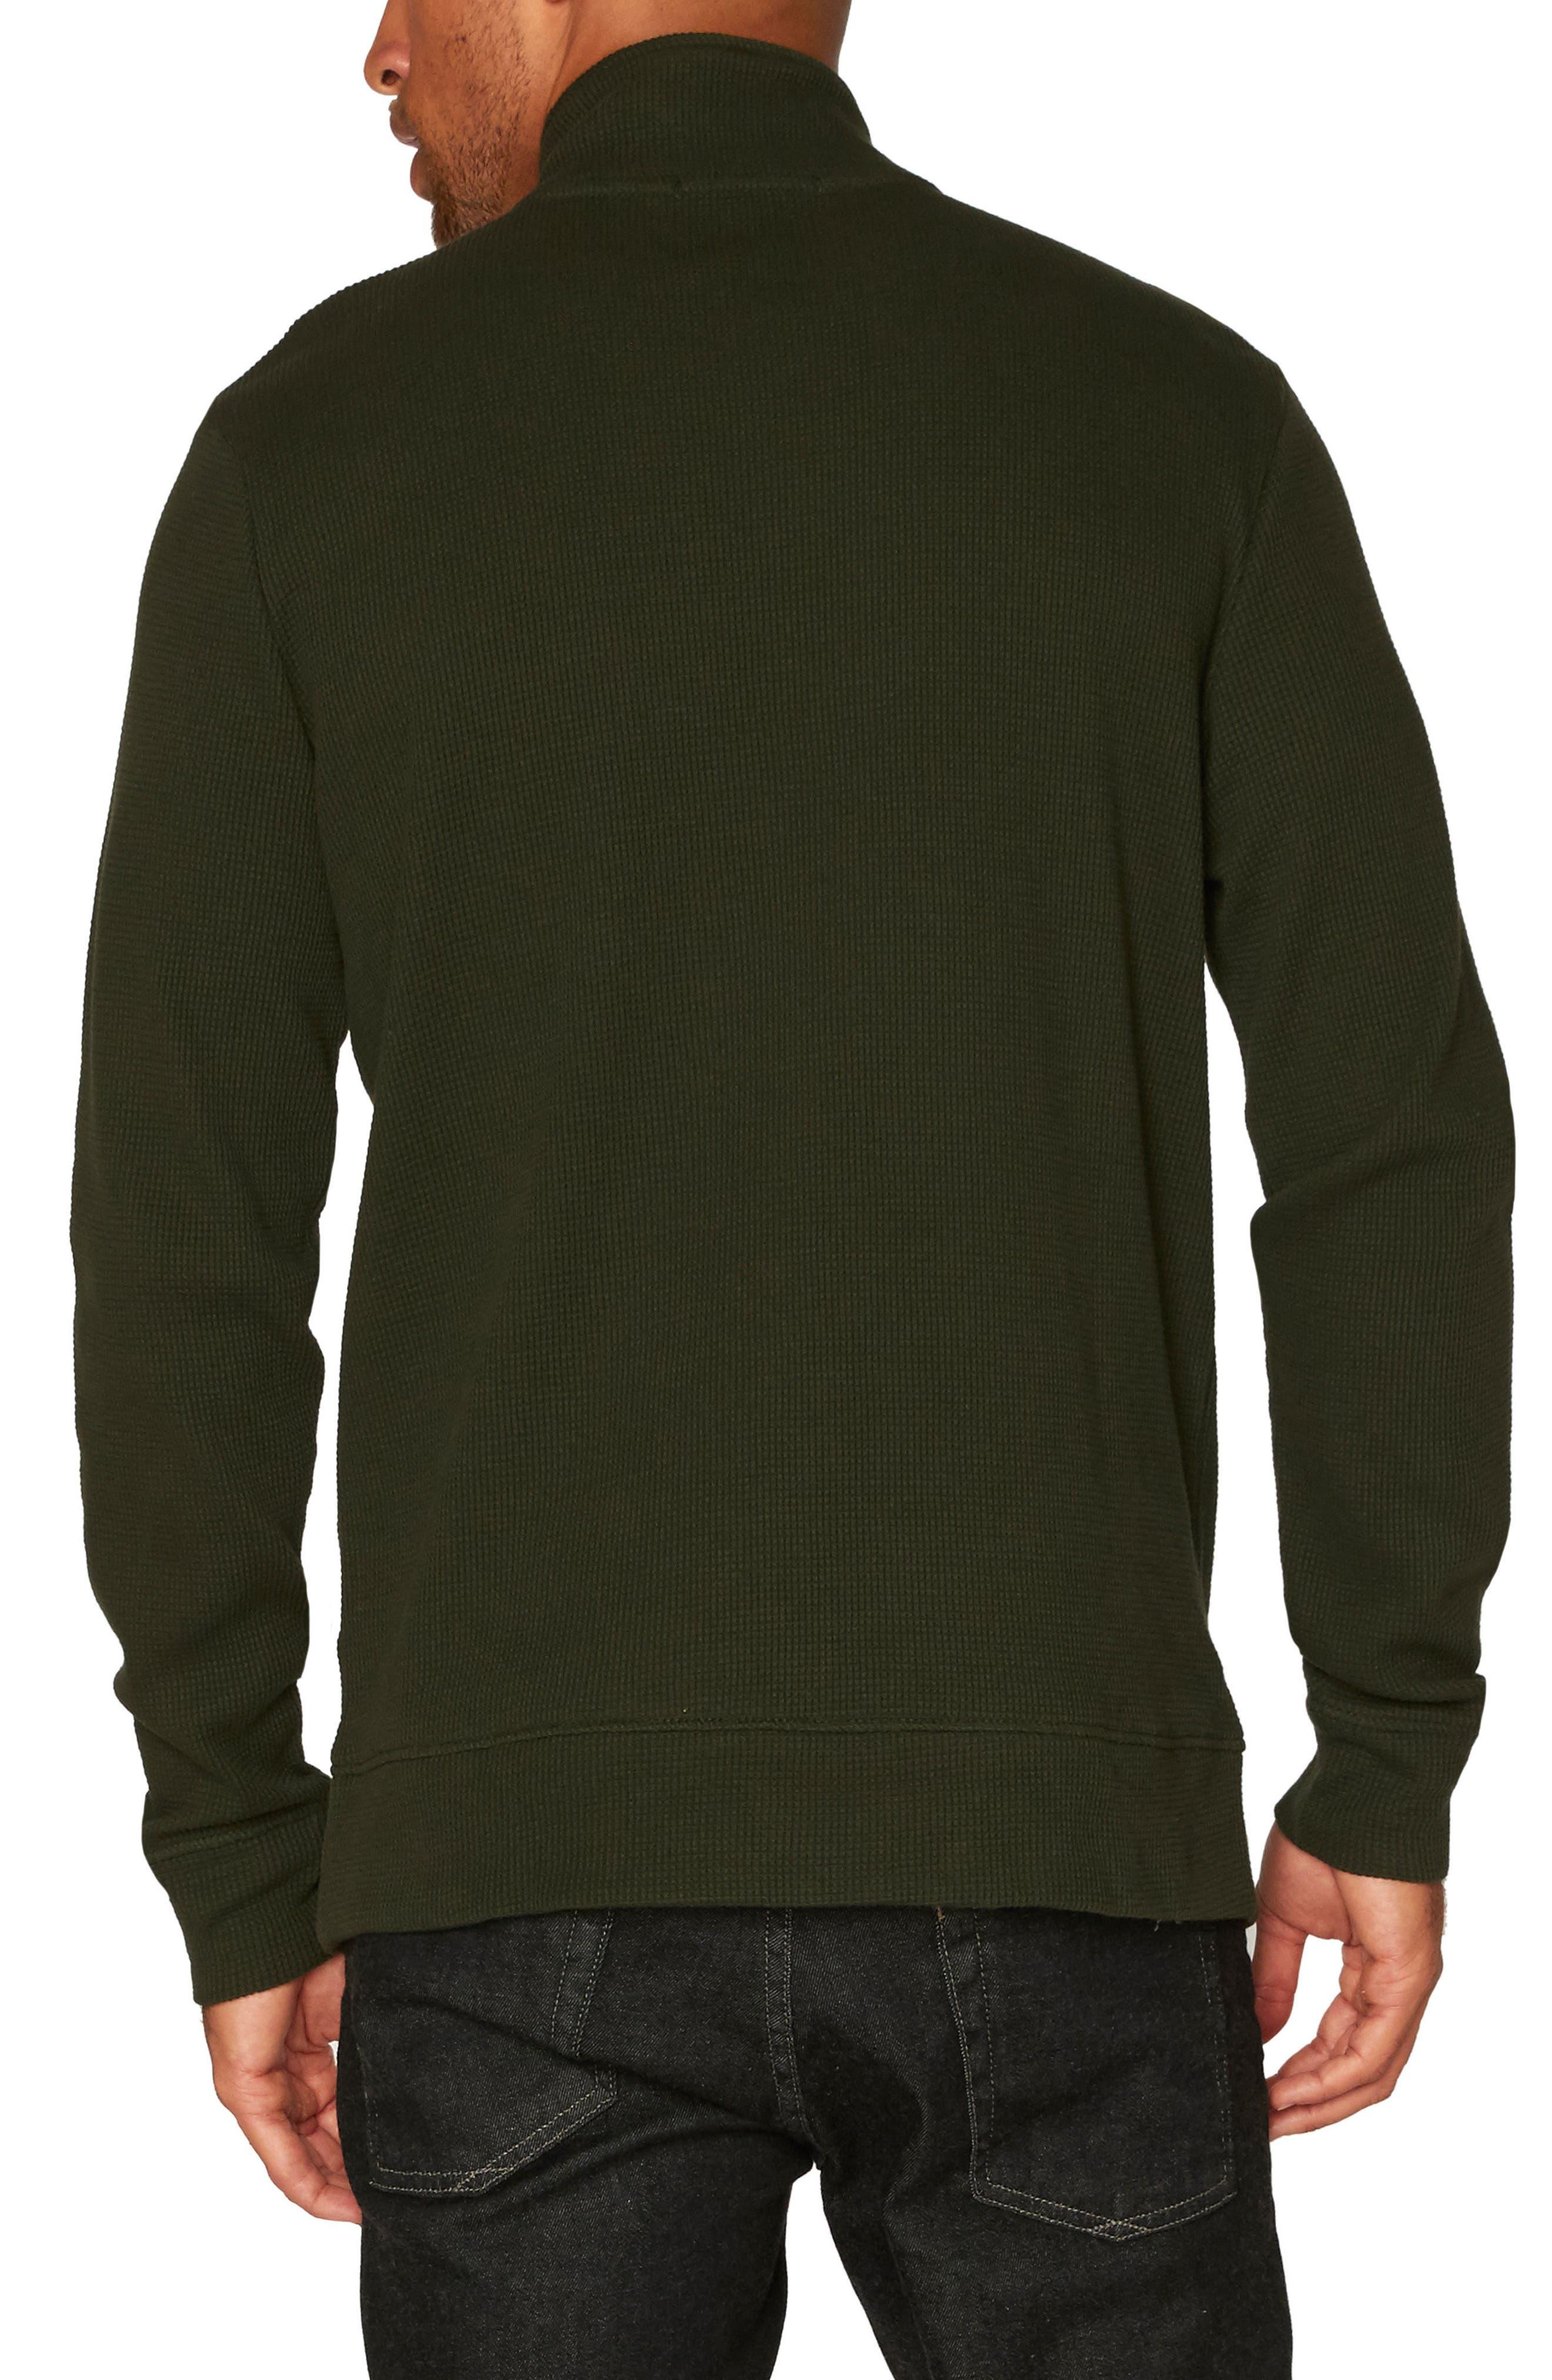 Chad Half Zip Thermal Pullover,                             Alternate thumbnail 2, color,                             Rosin